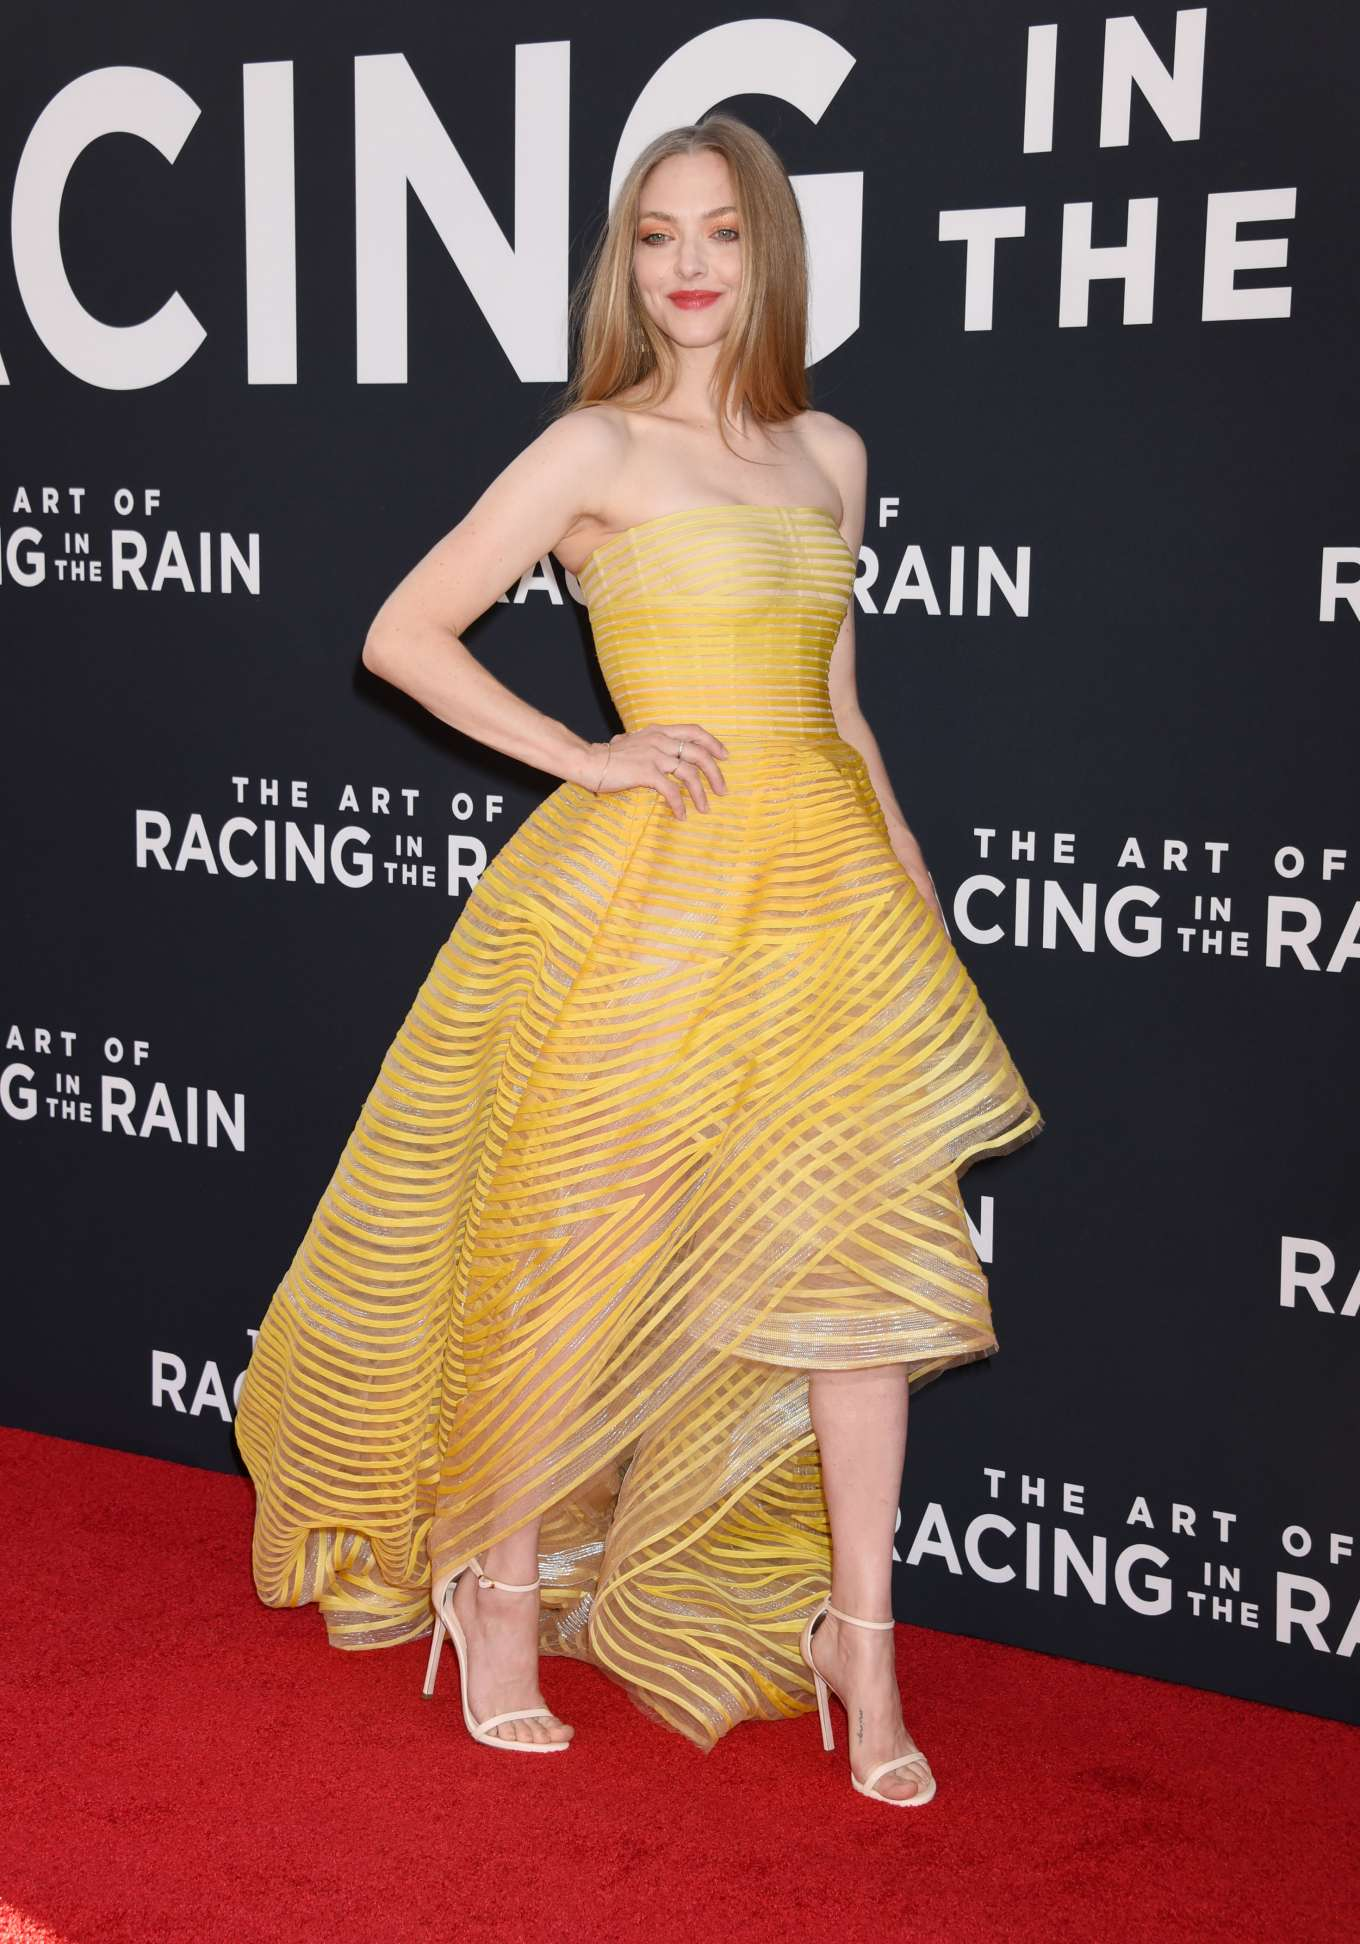 Amanda Seyfried - 'The Art Of Racing in The Rain' Premiere in Los Angeles